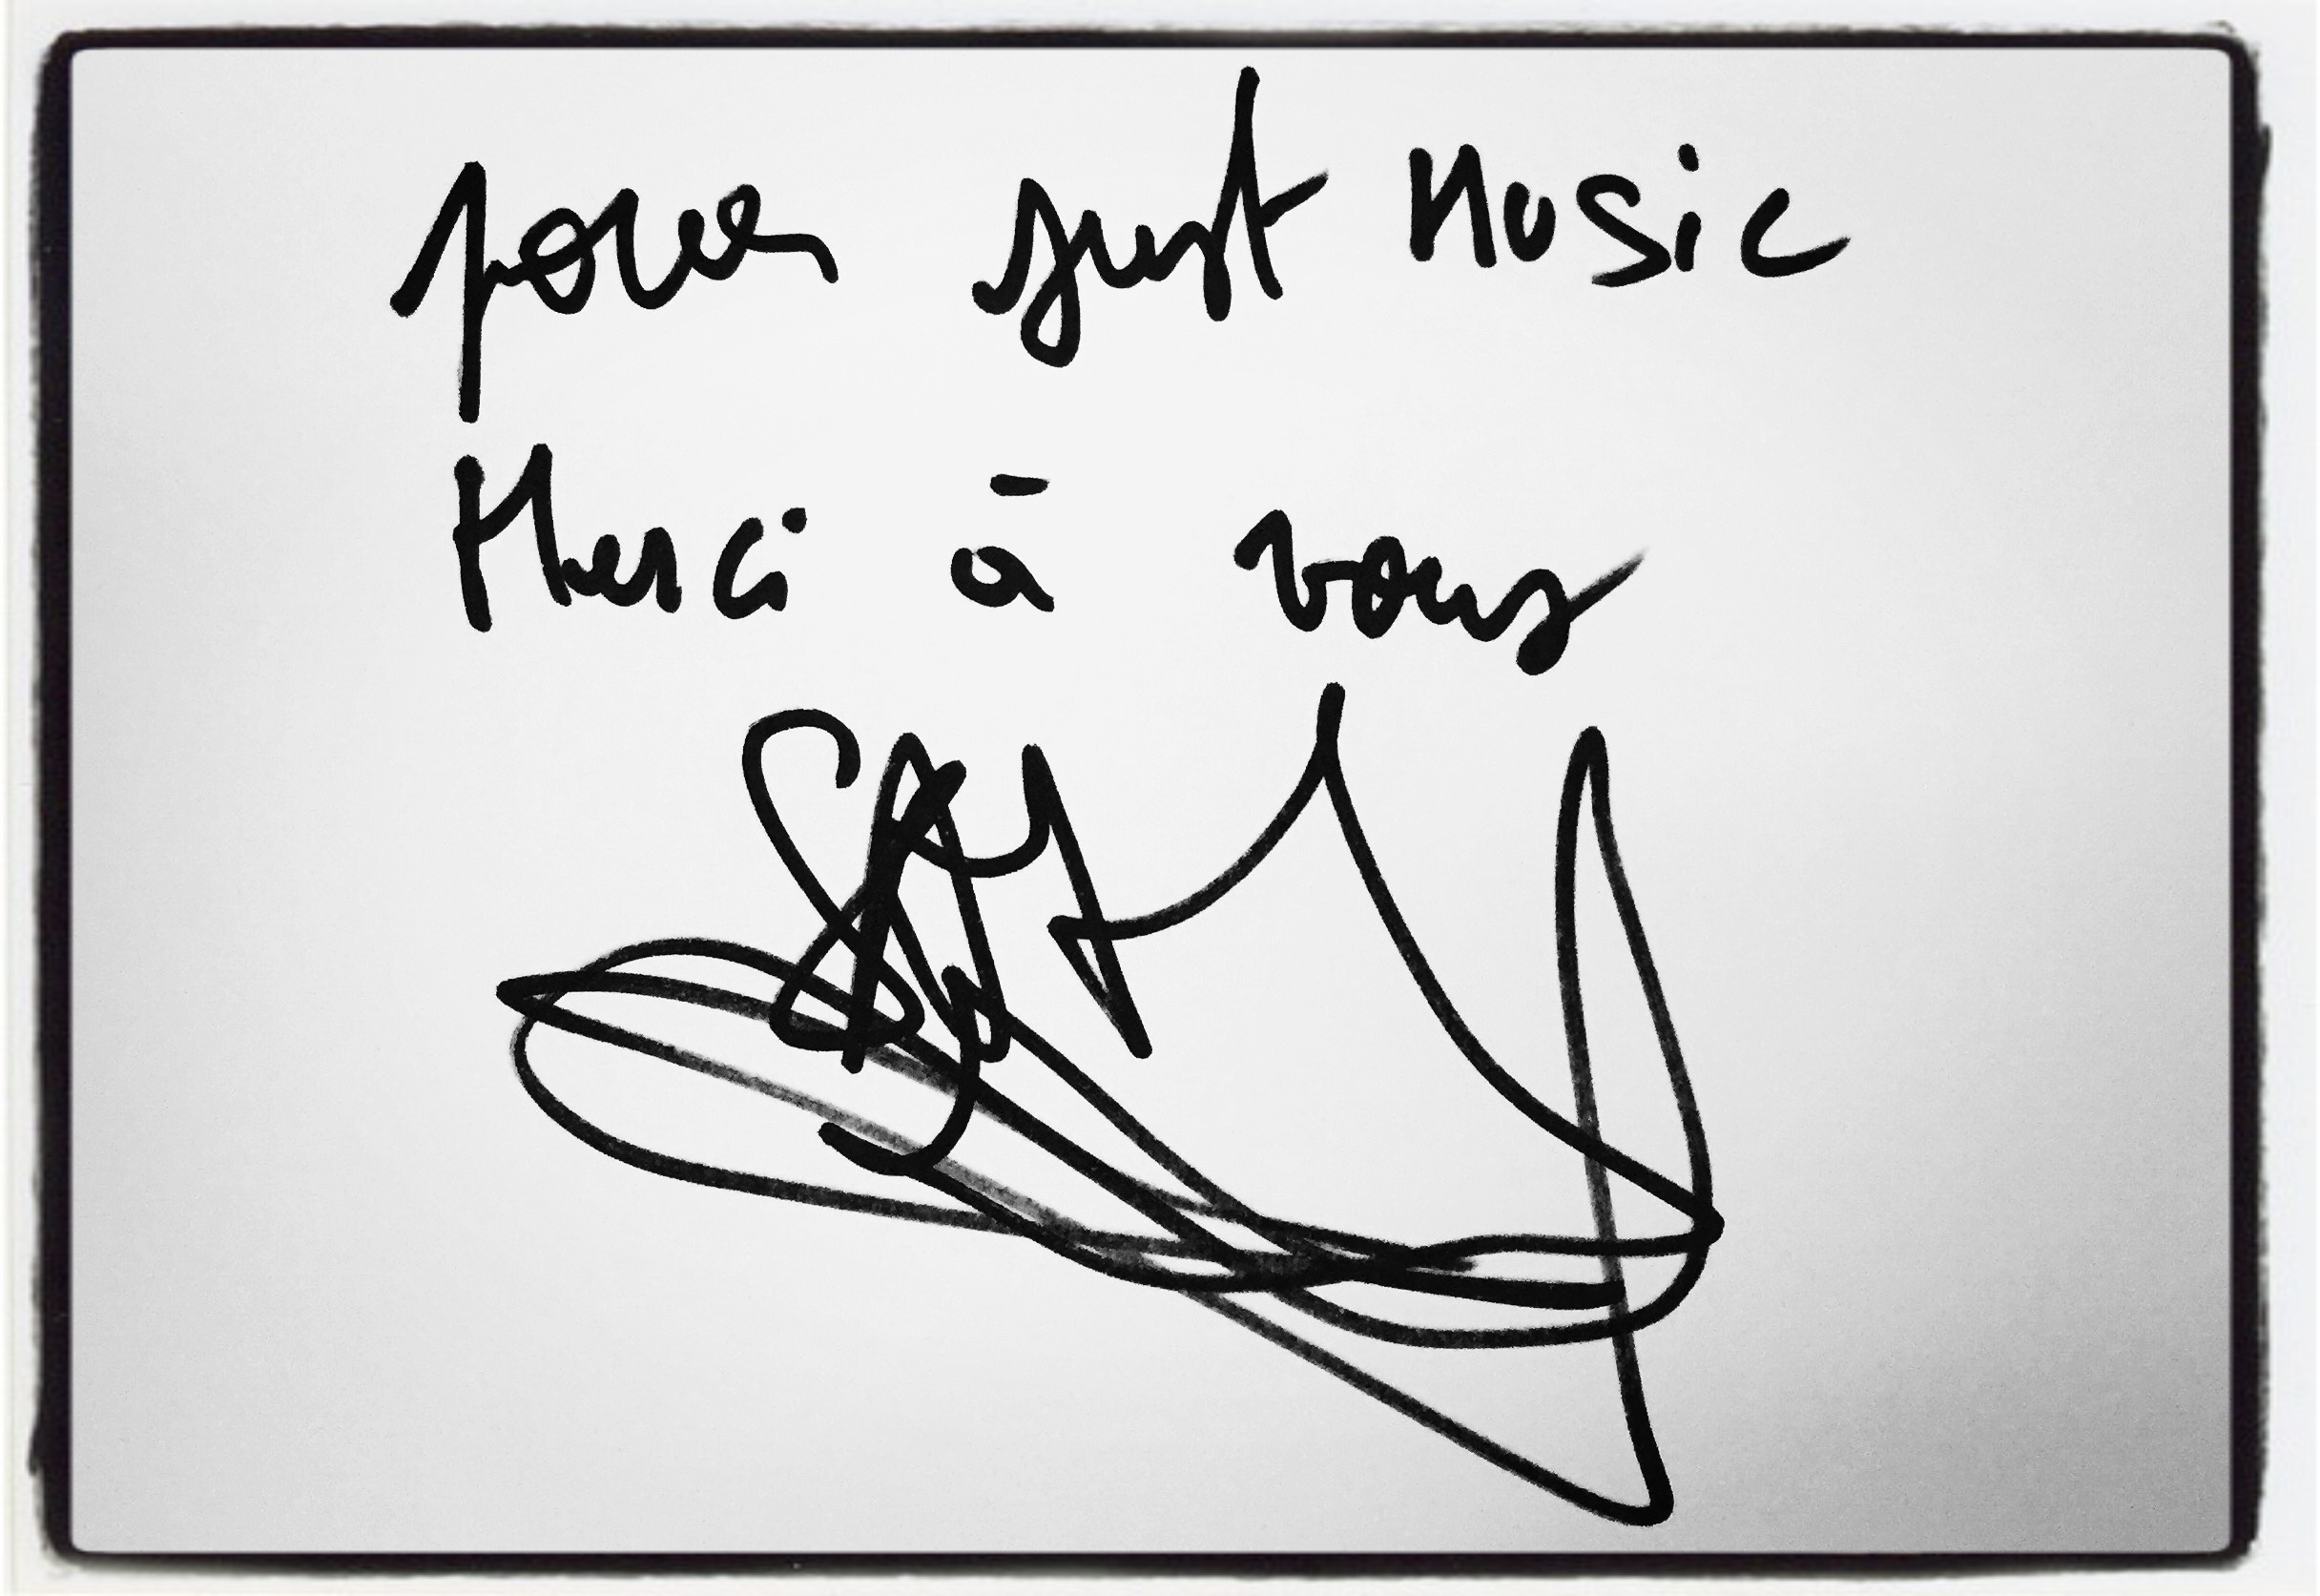 Sam Mayer JustMusic.fr Dédicace